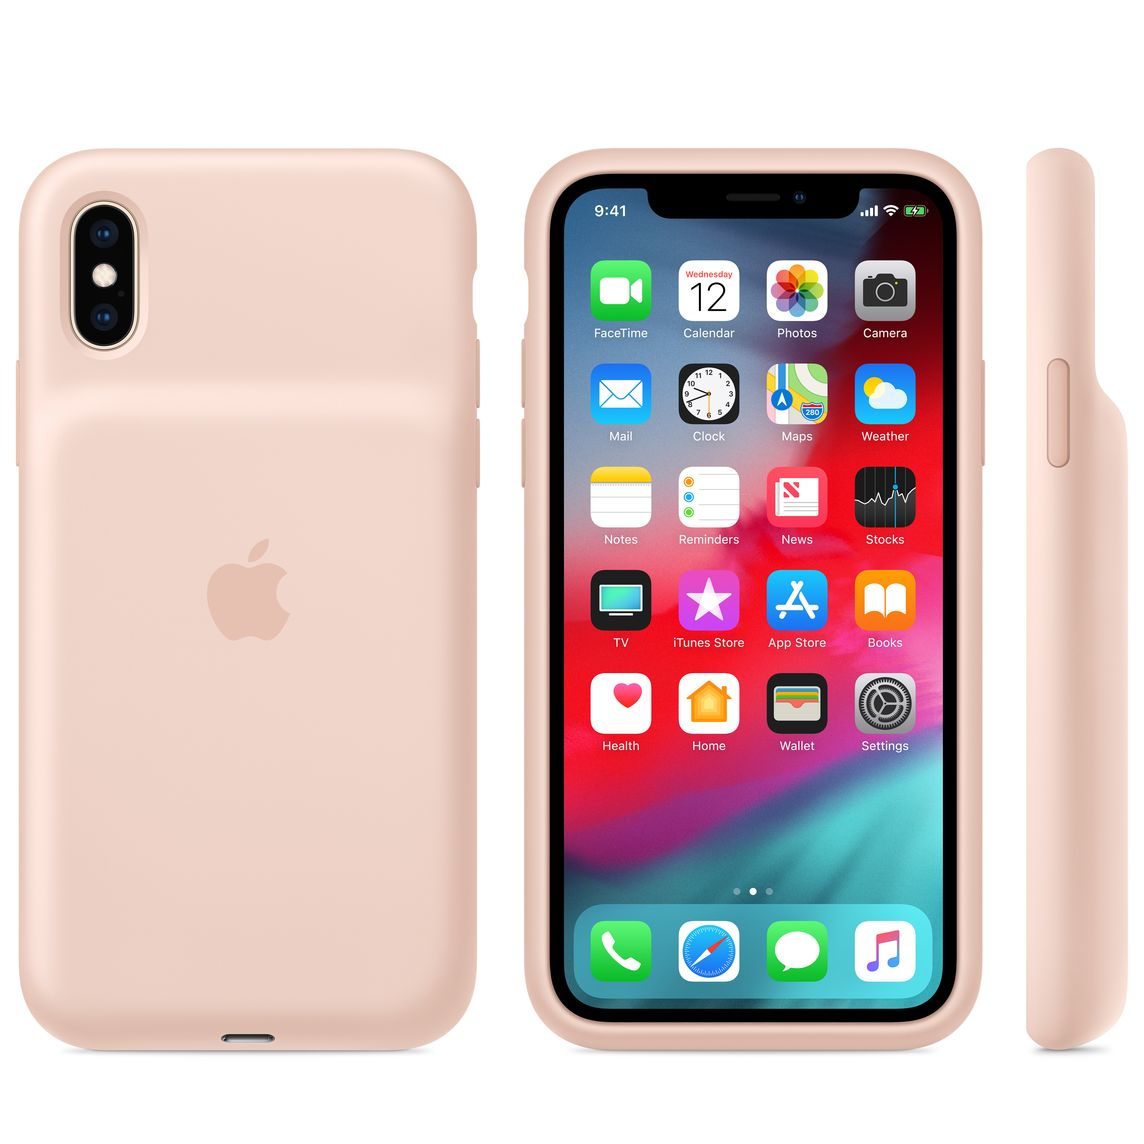 online retailer 5cb27 f1e2e iPhone XS Smart Battery Case - Pink Sand